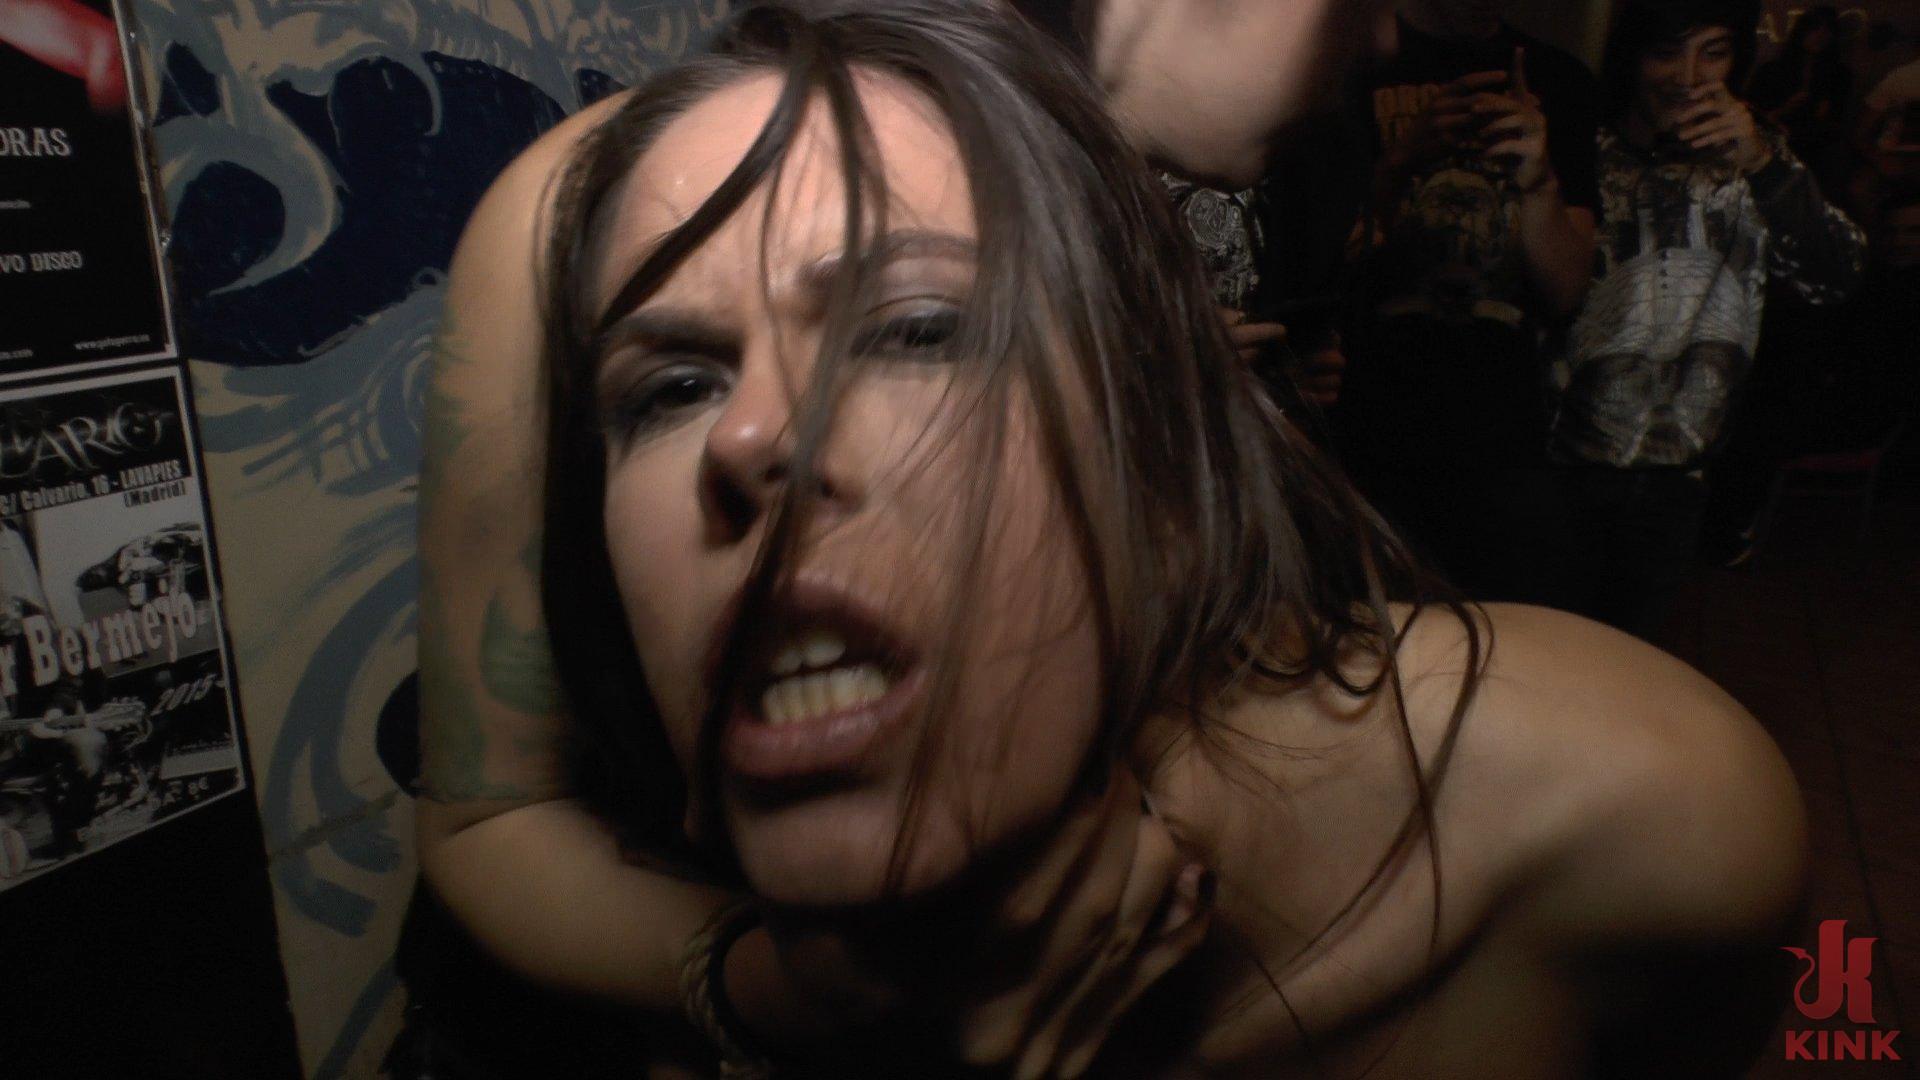 Bella Slut spagnola Completamente Umiliato sul palco del Concerto live (Kink)